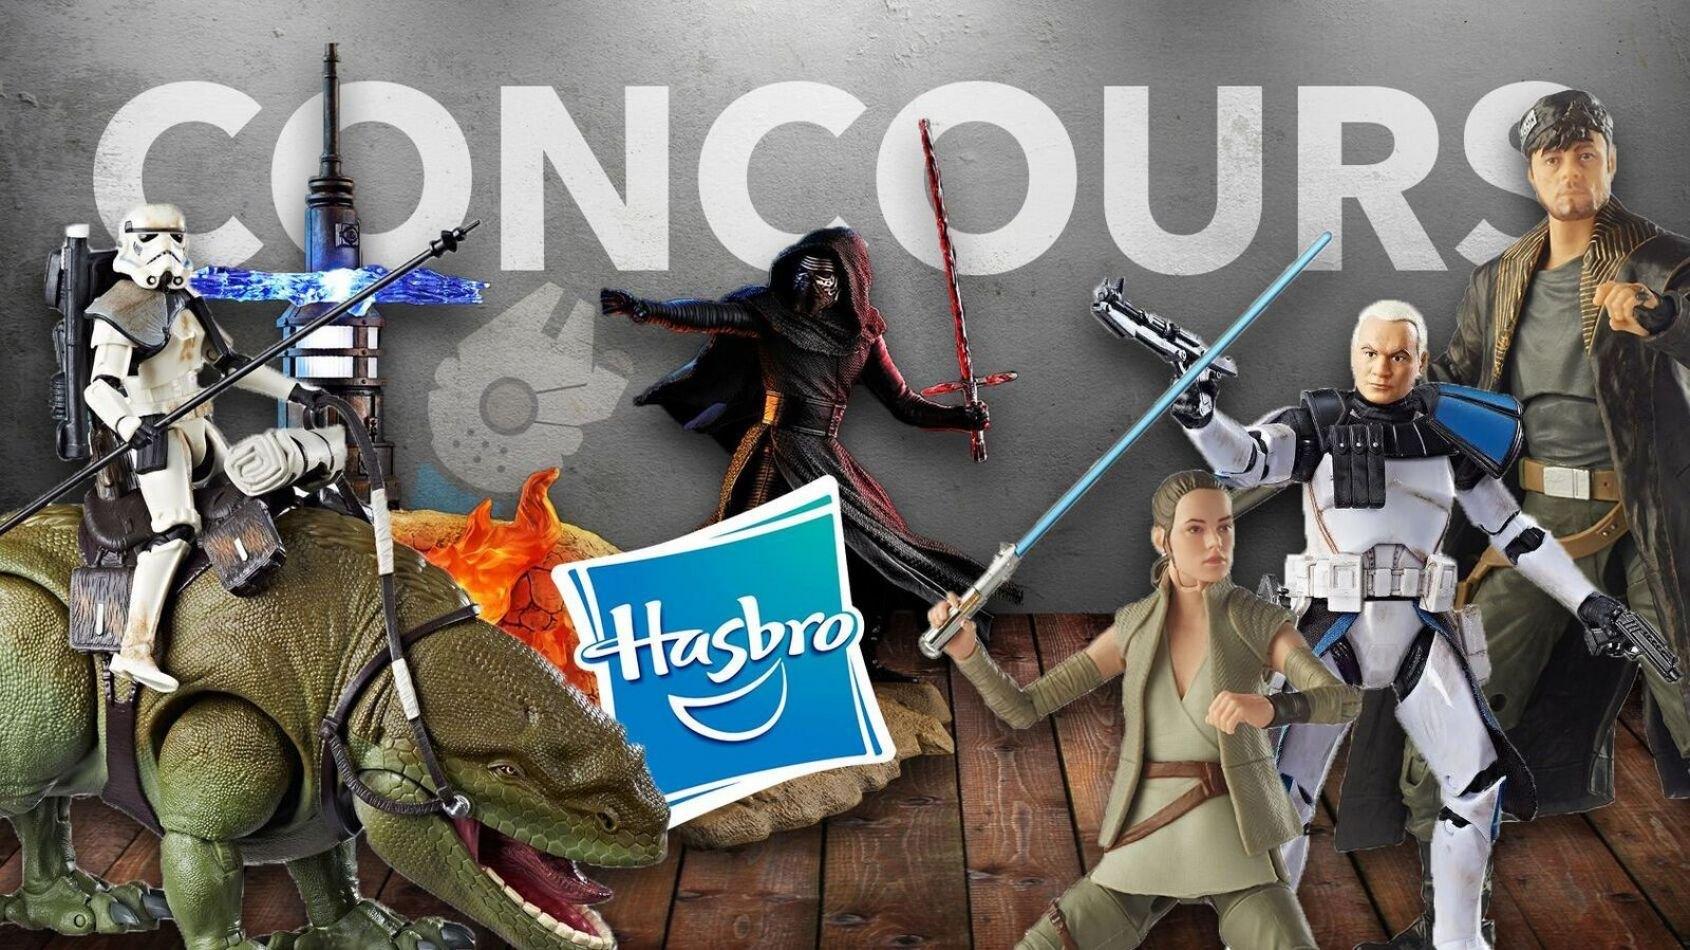 CONCOURS : Gagnez des figurines Hasbro Blackseries !